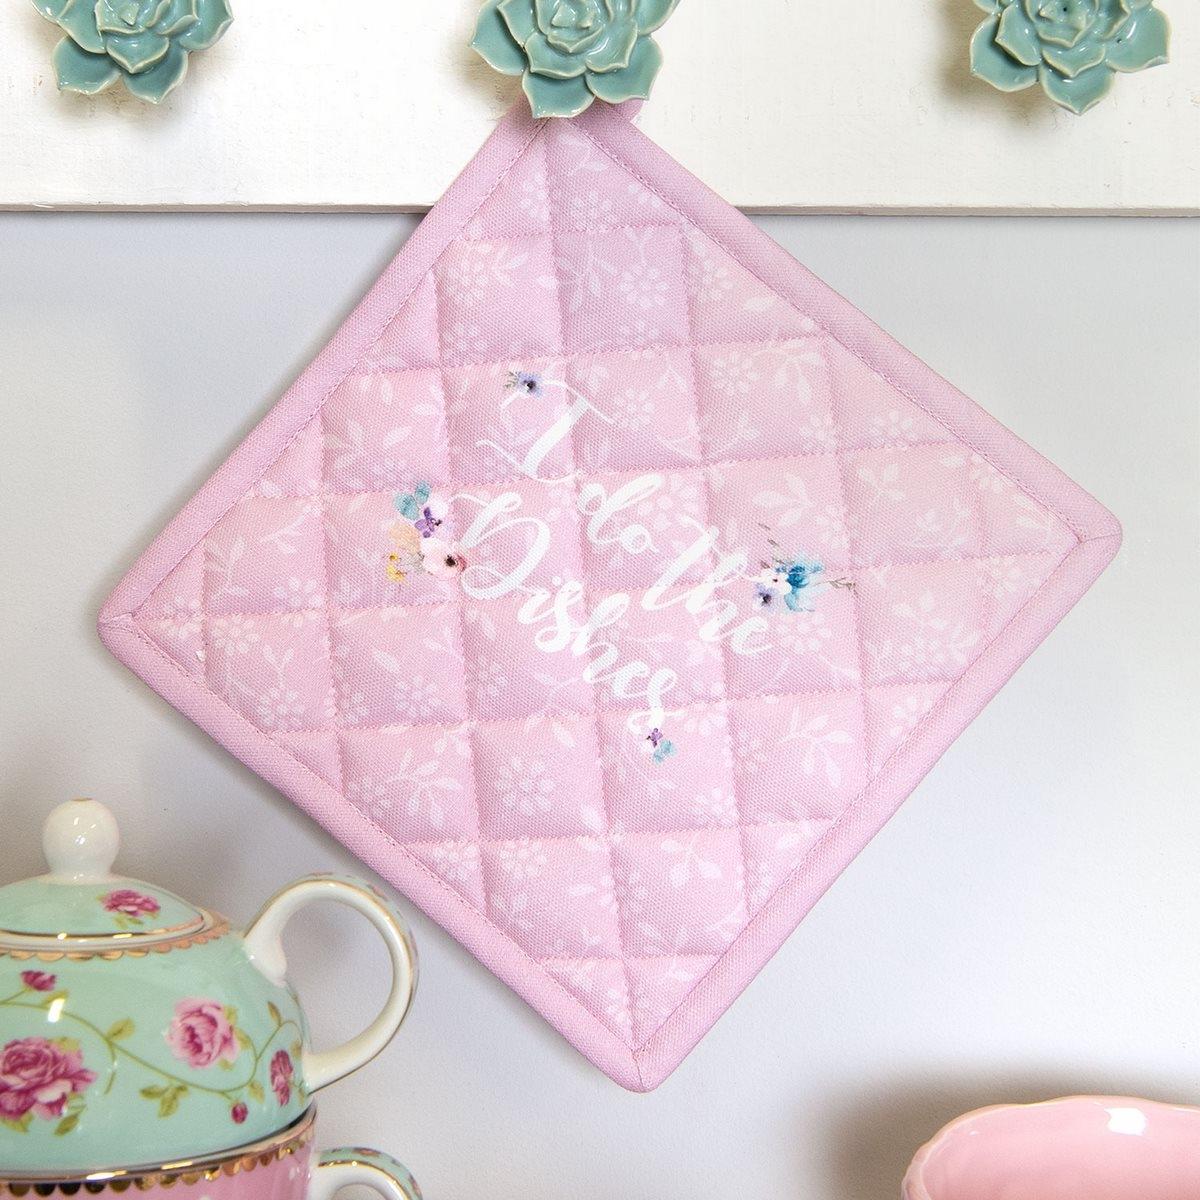 Suport pentru vase fierbinti din bumbac roz alb 20 cm x 20 cm